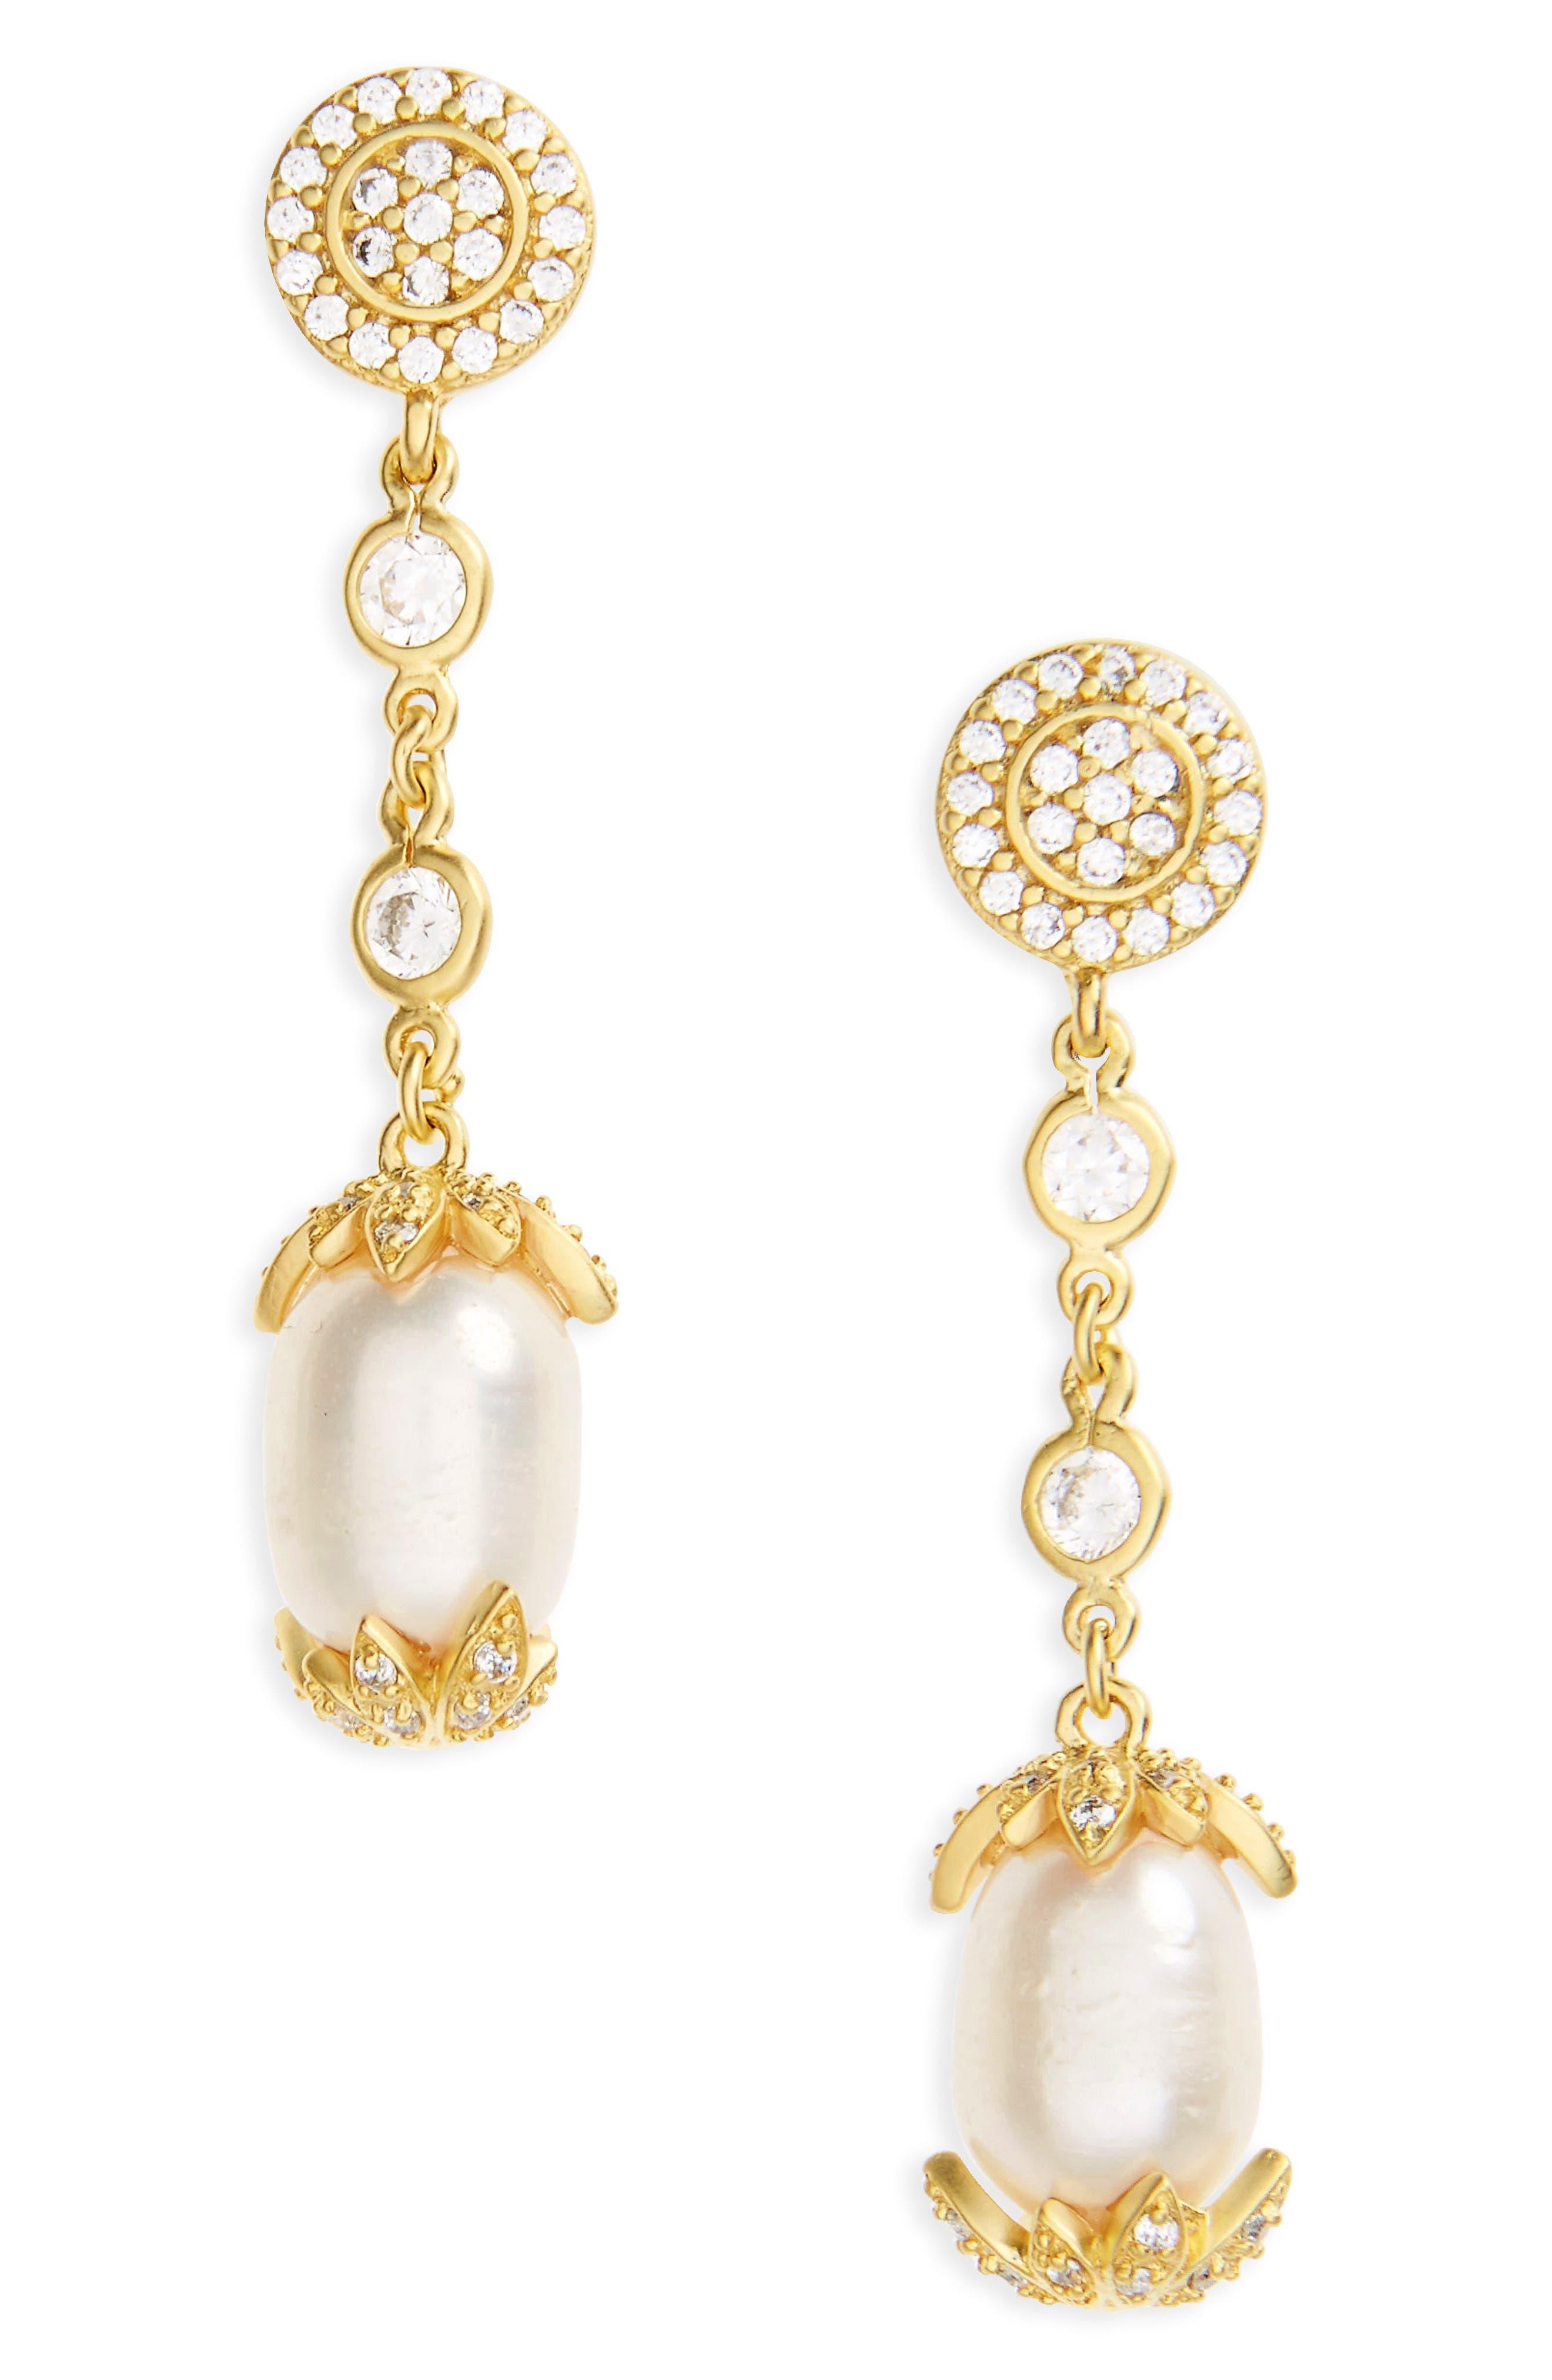 Main Image - FREIDA ROTHMAN Audrey Linear Drop Earrings